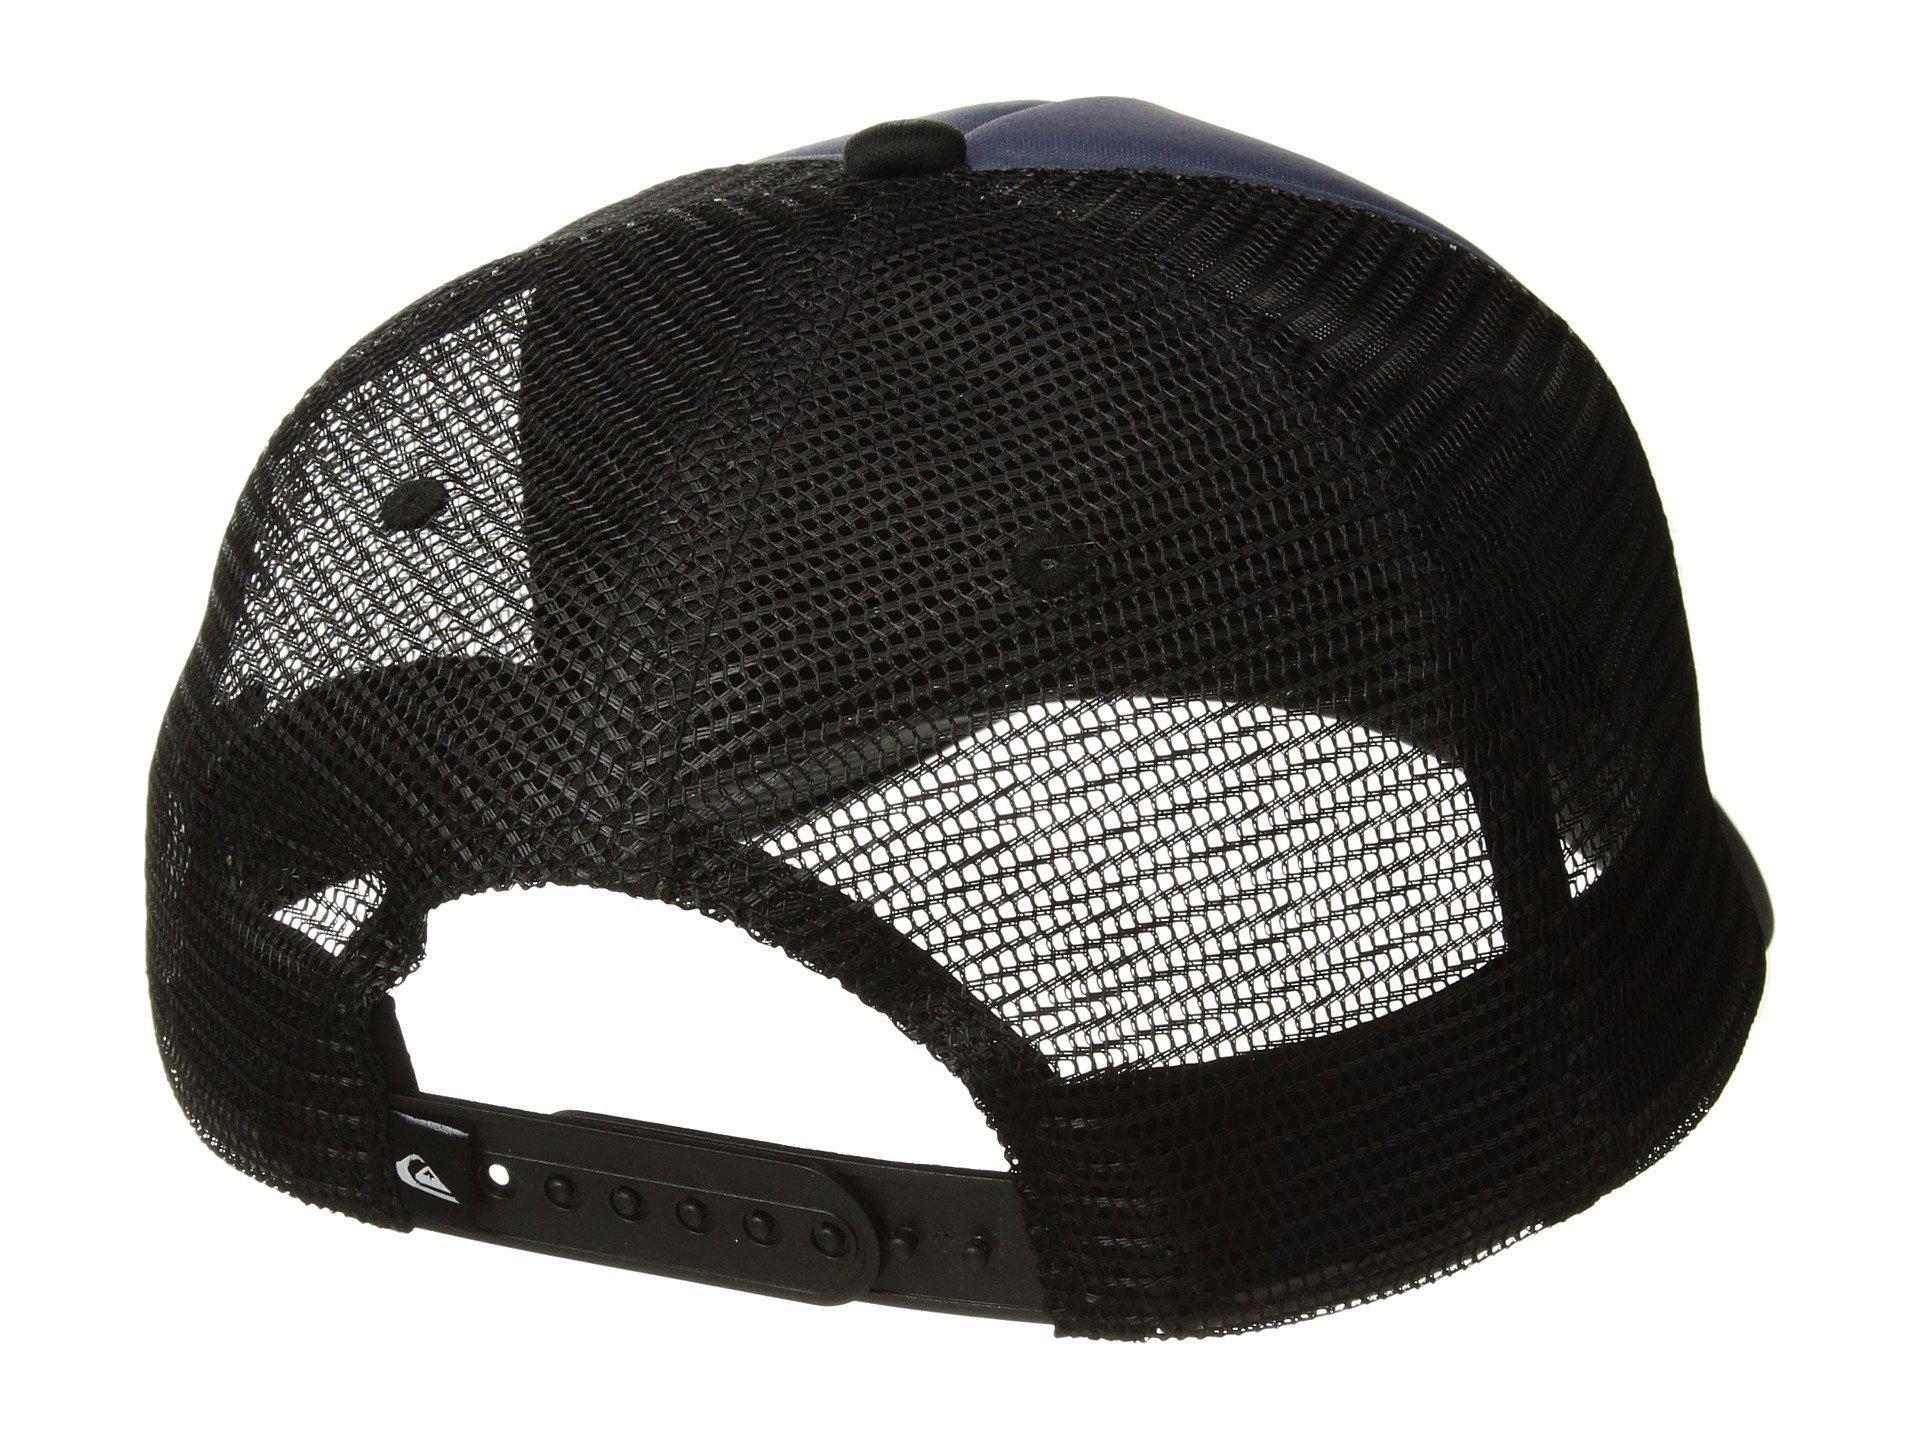 Quiksilver - Black Stripe Stare Cap (vintage Indigo) Baseball Caps for Men  - Lyst. View fullscreen 2301c09ec9dc